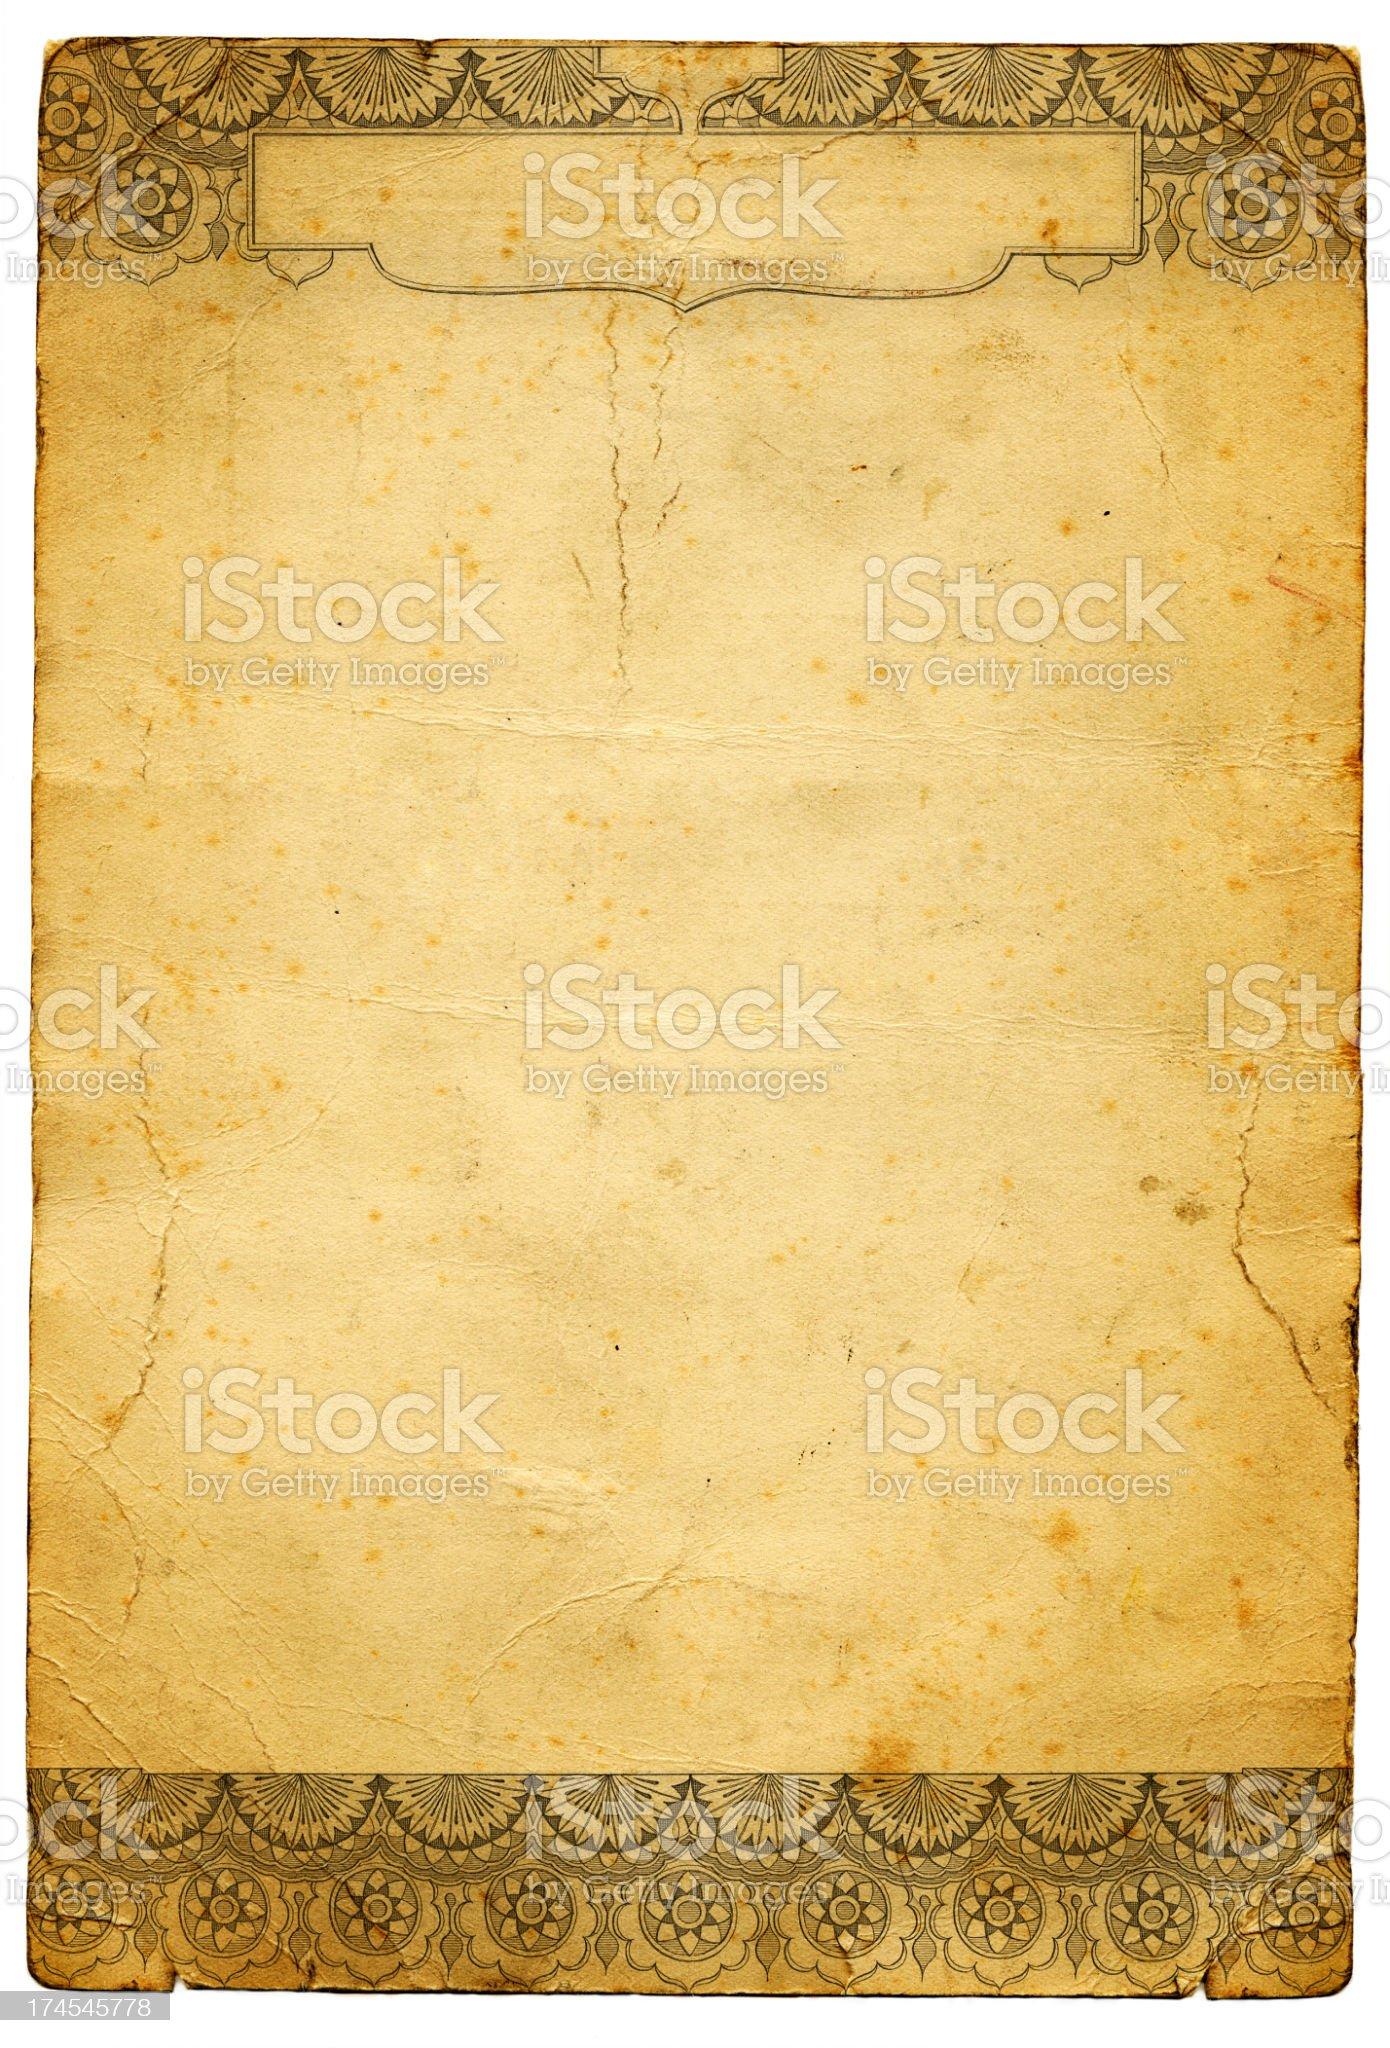 Grunge paper royalty-free stock photo